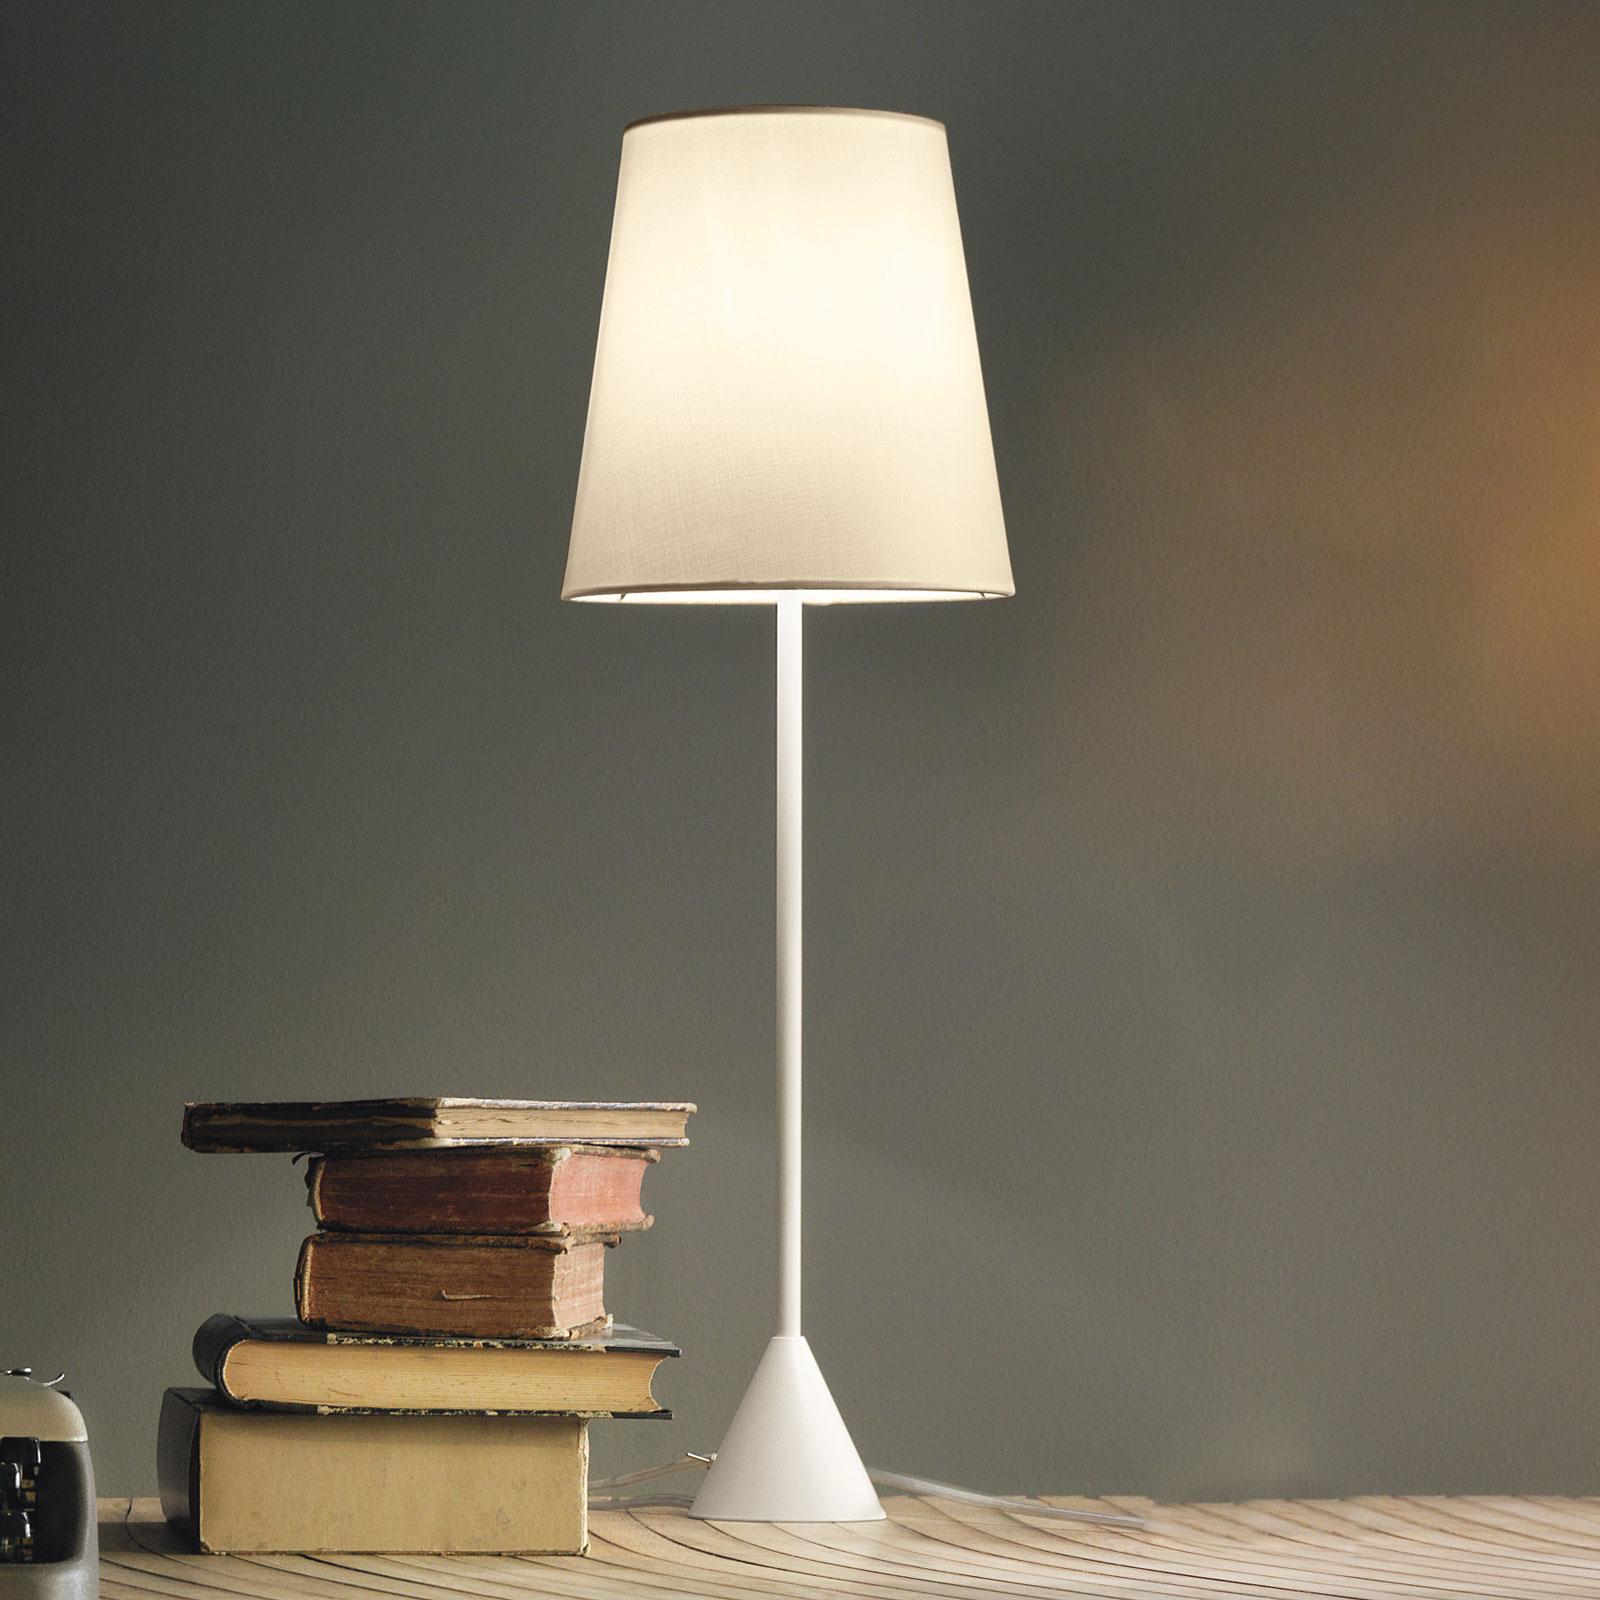 Modo Luce Lucilla tafellamp Ø 24cm wit/ivoor